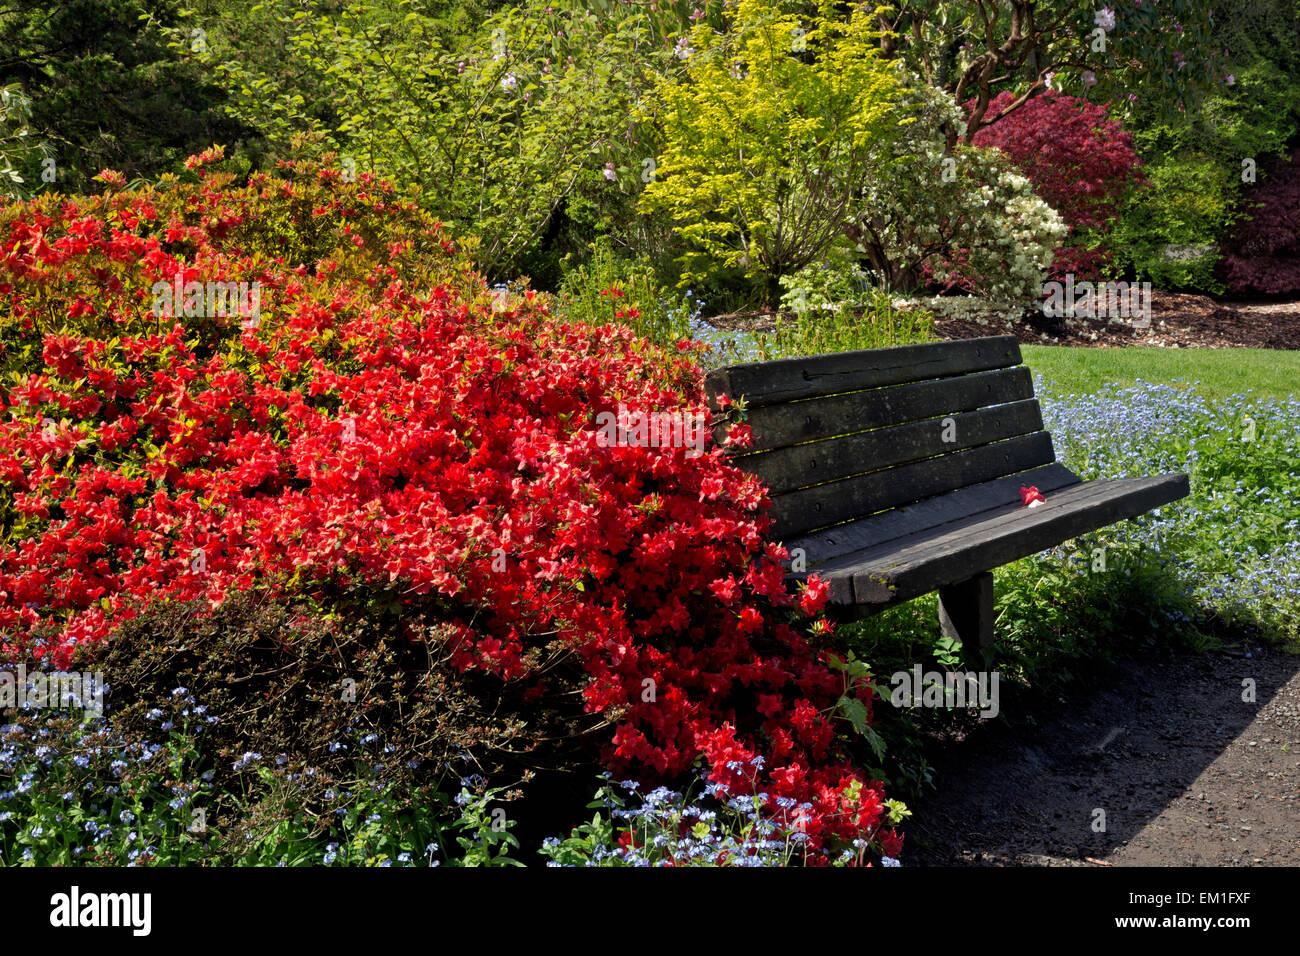 WA10290-00...WASHINGTON - Azaleas growing around a bench at Kubota Garden in Seattle. - Stock Image